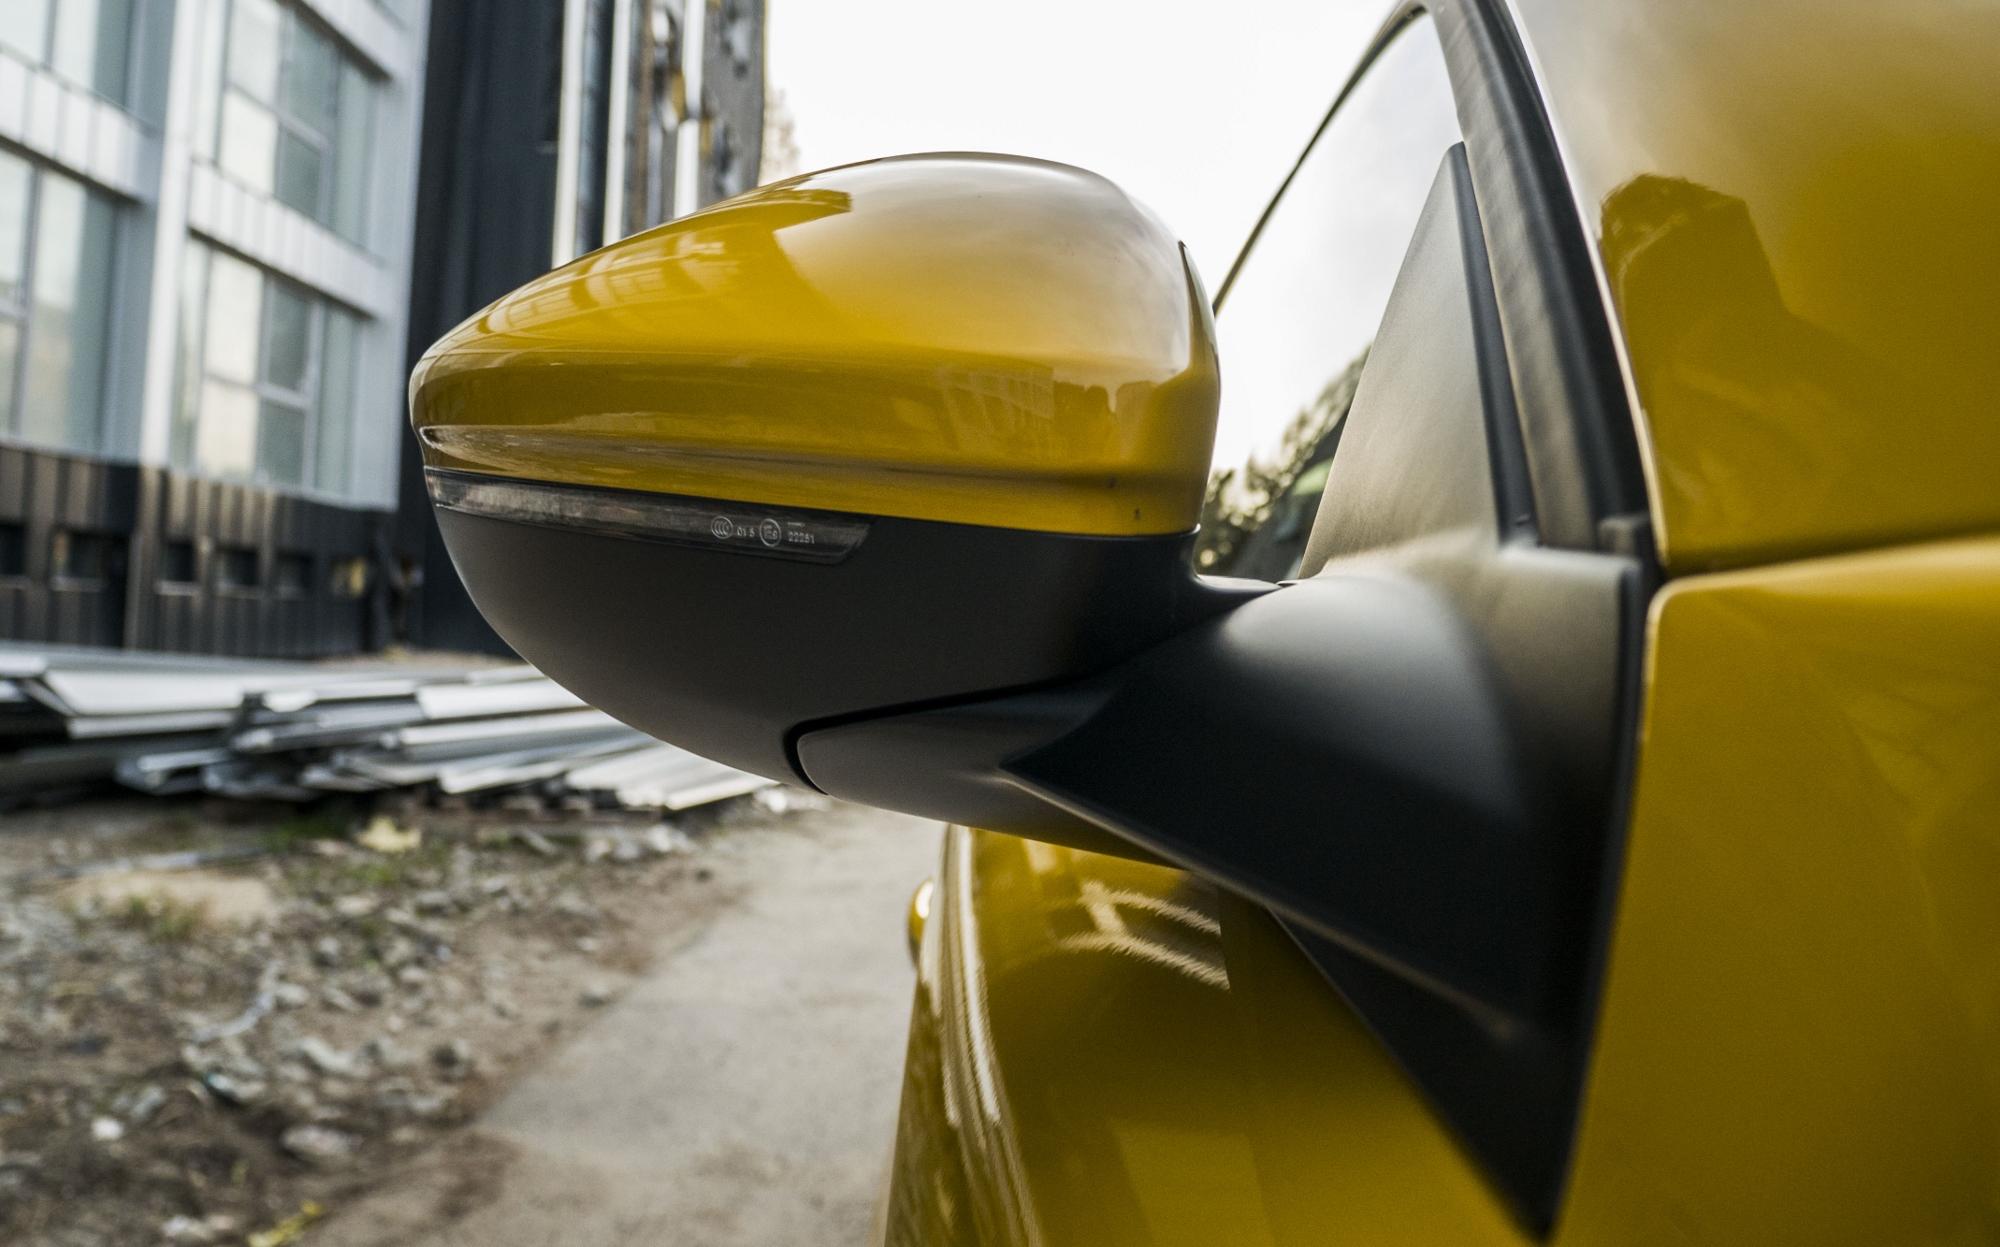 Test: Peugeot 208 prekvapivo pútal pohľady xbpU6bPlRj peugeot-208-24